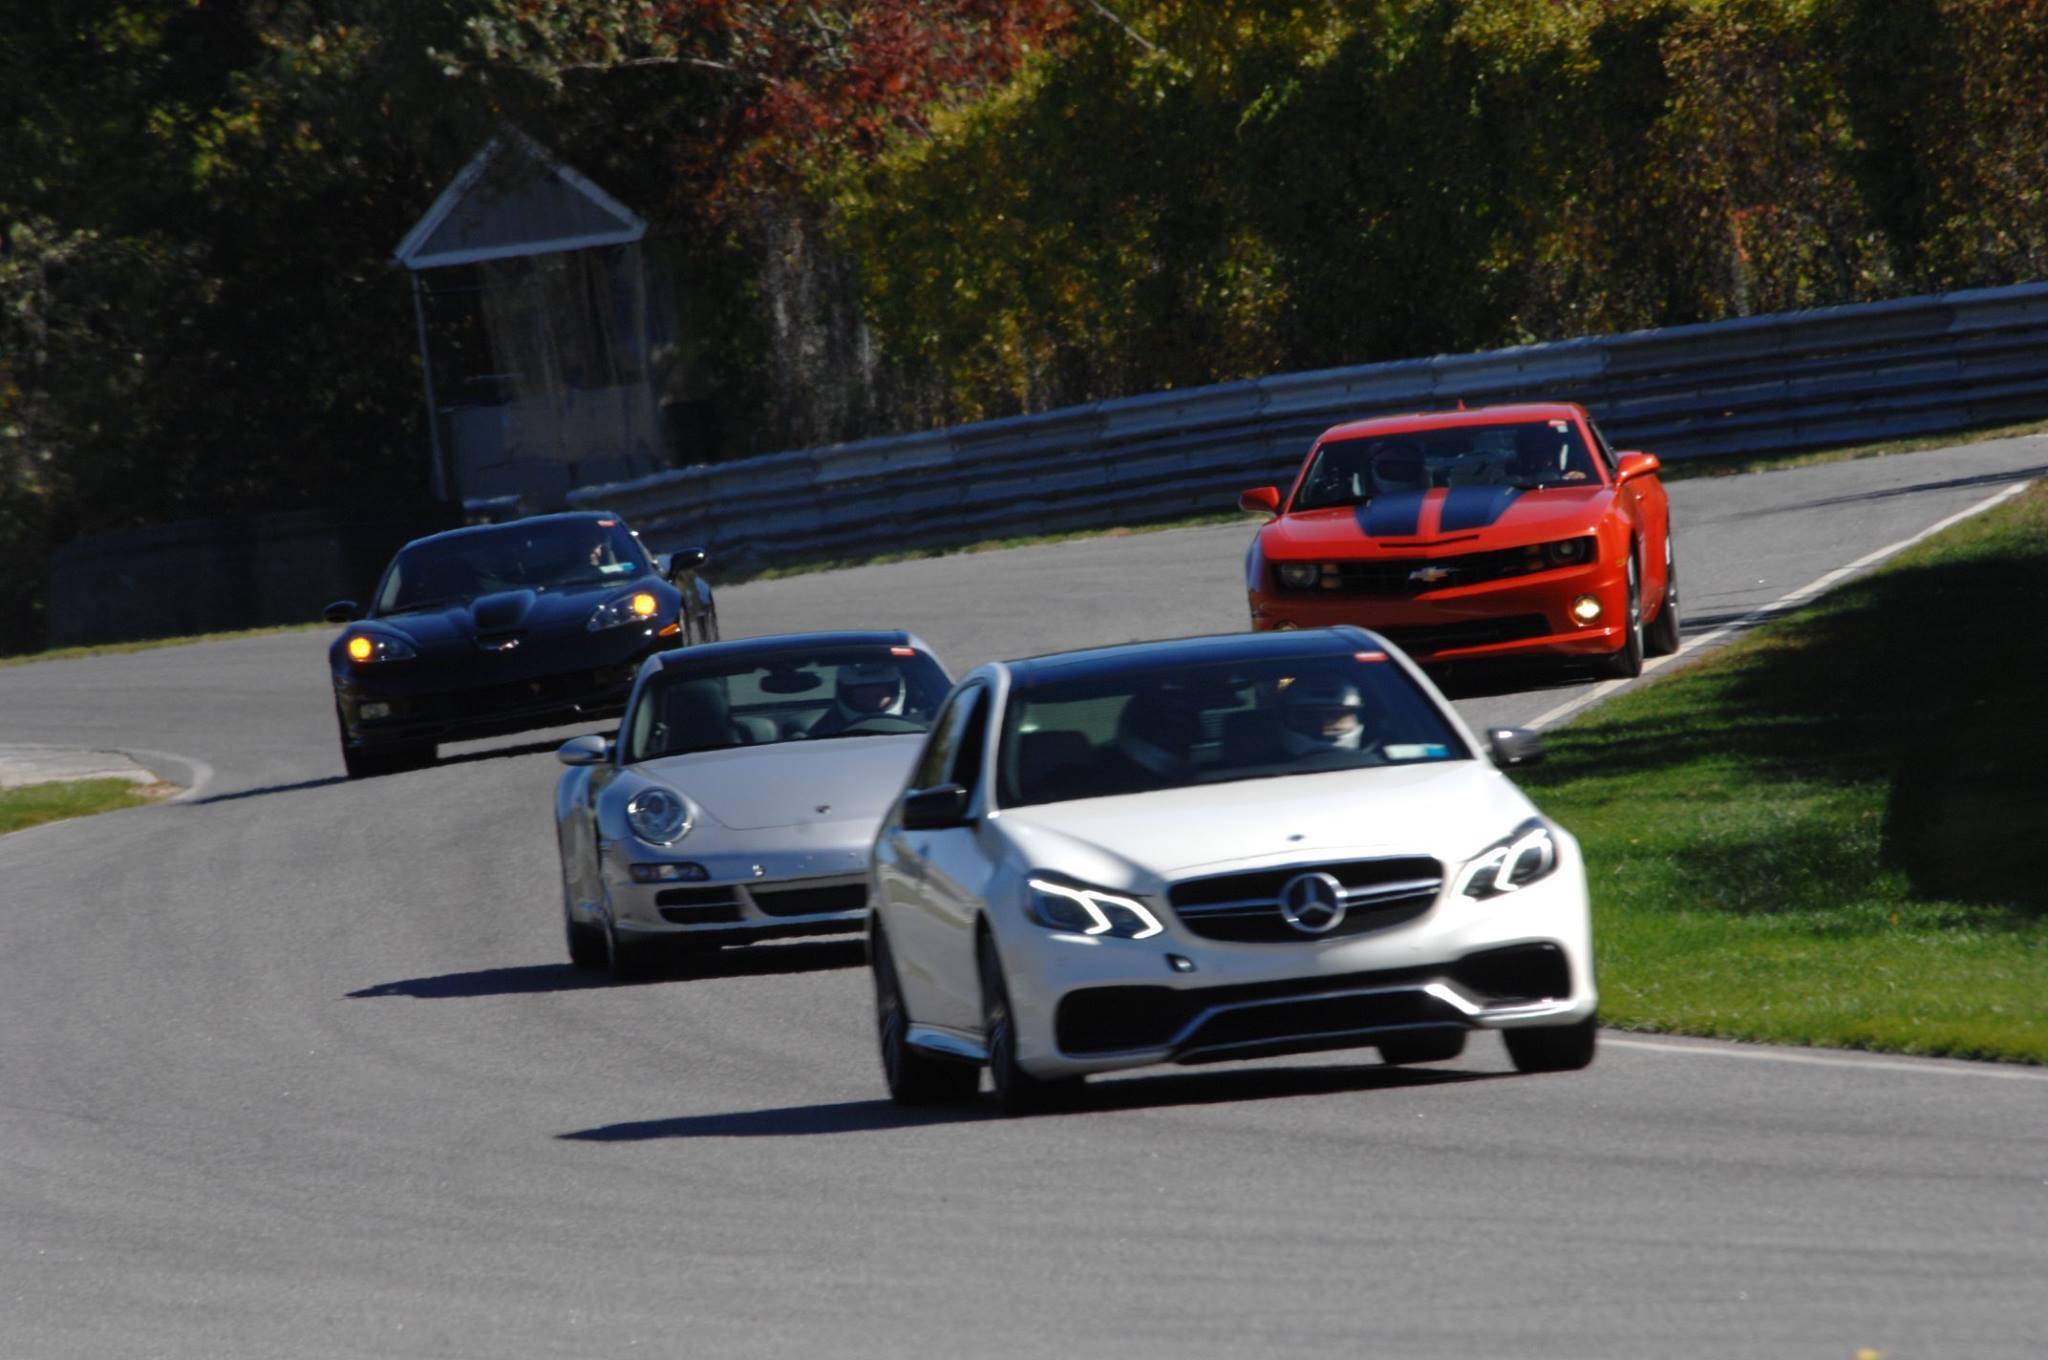 SCDA Lime Rock Park Track Event April Rd Info On Apr - Sport car driving